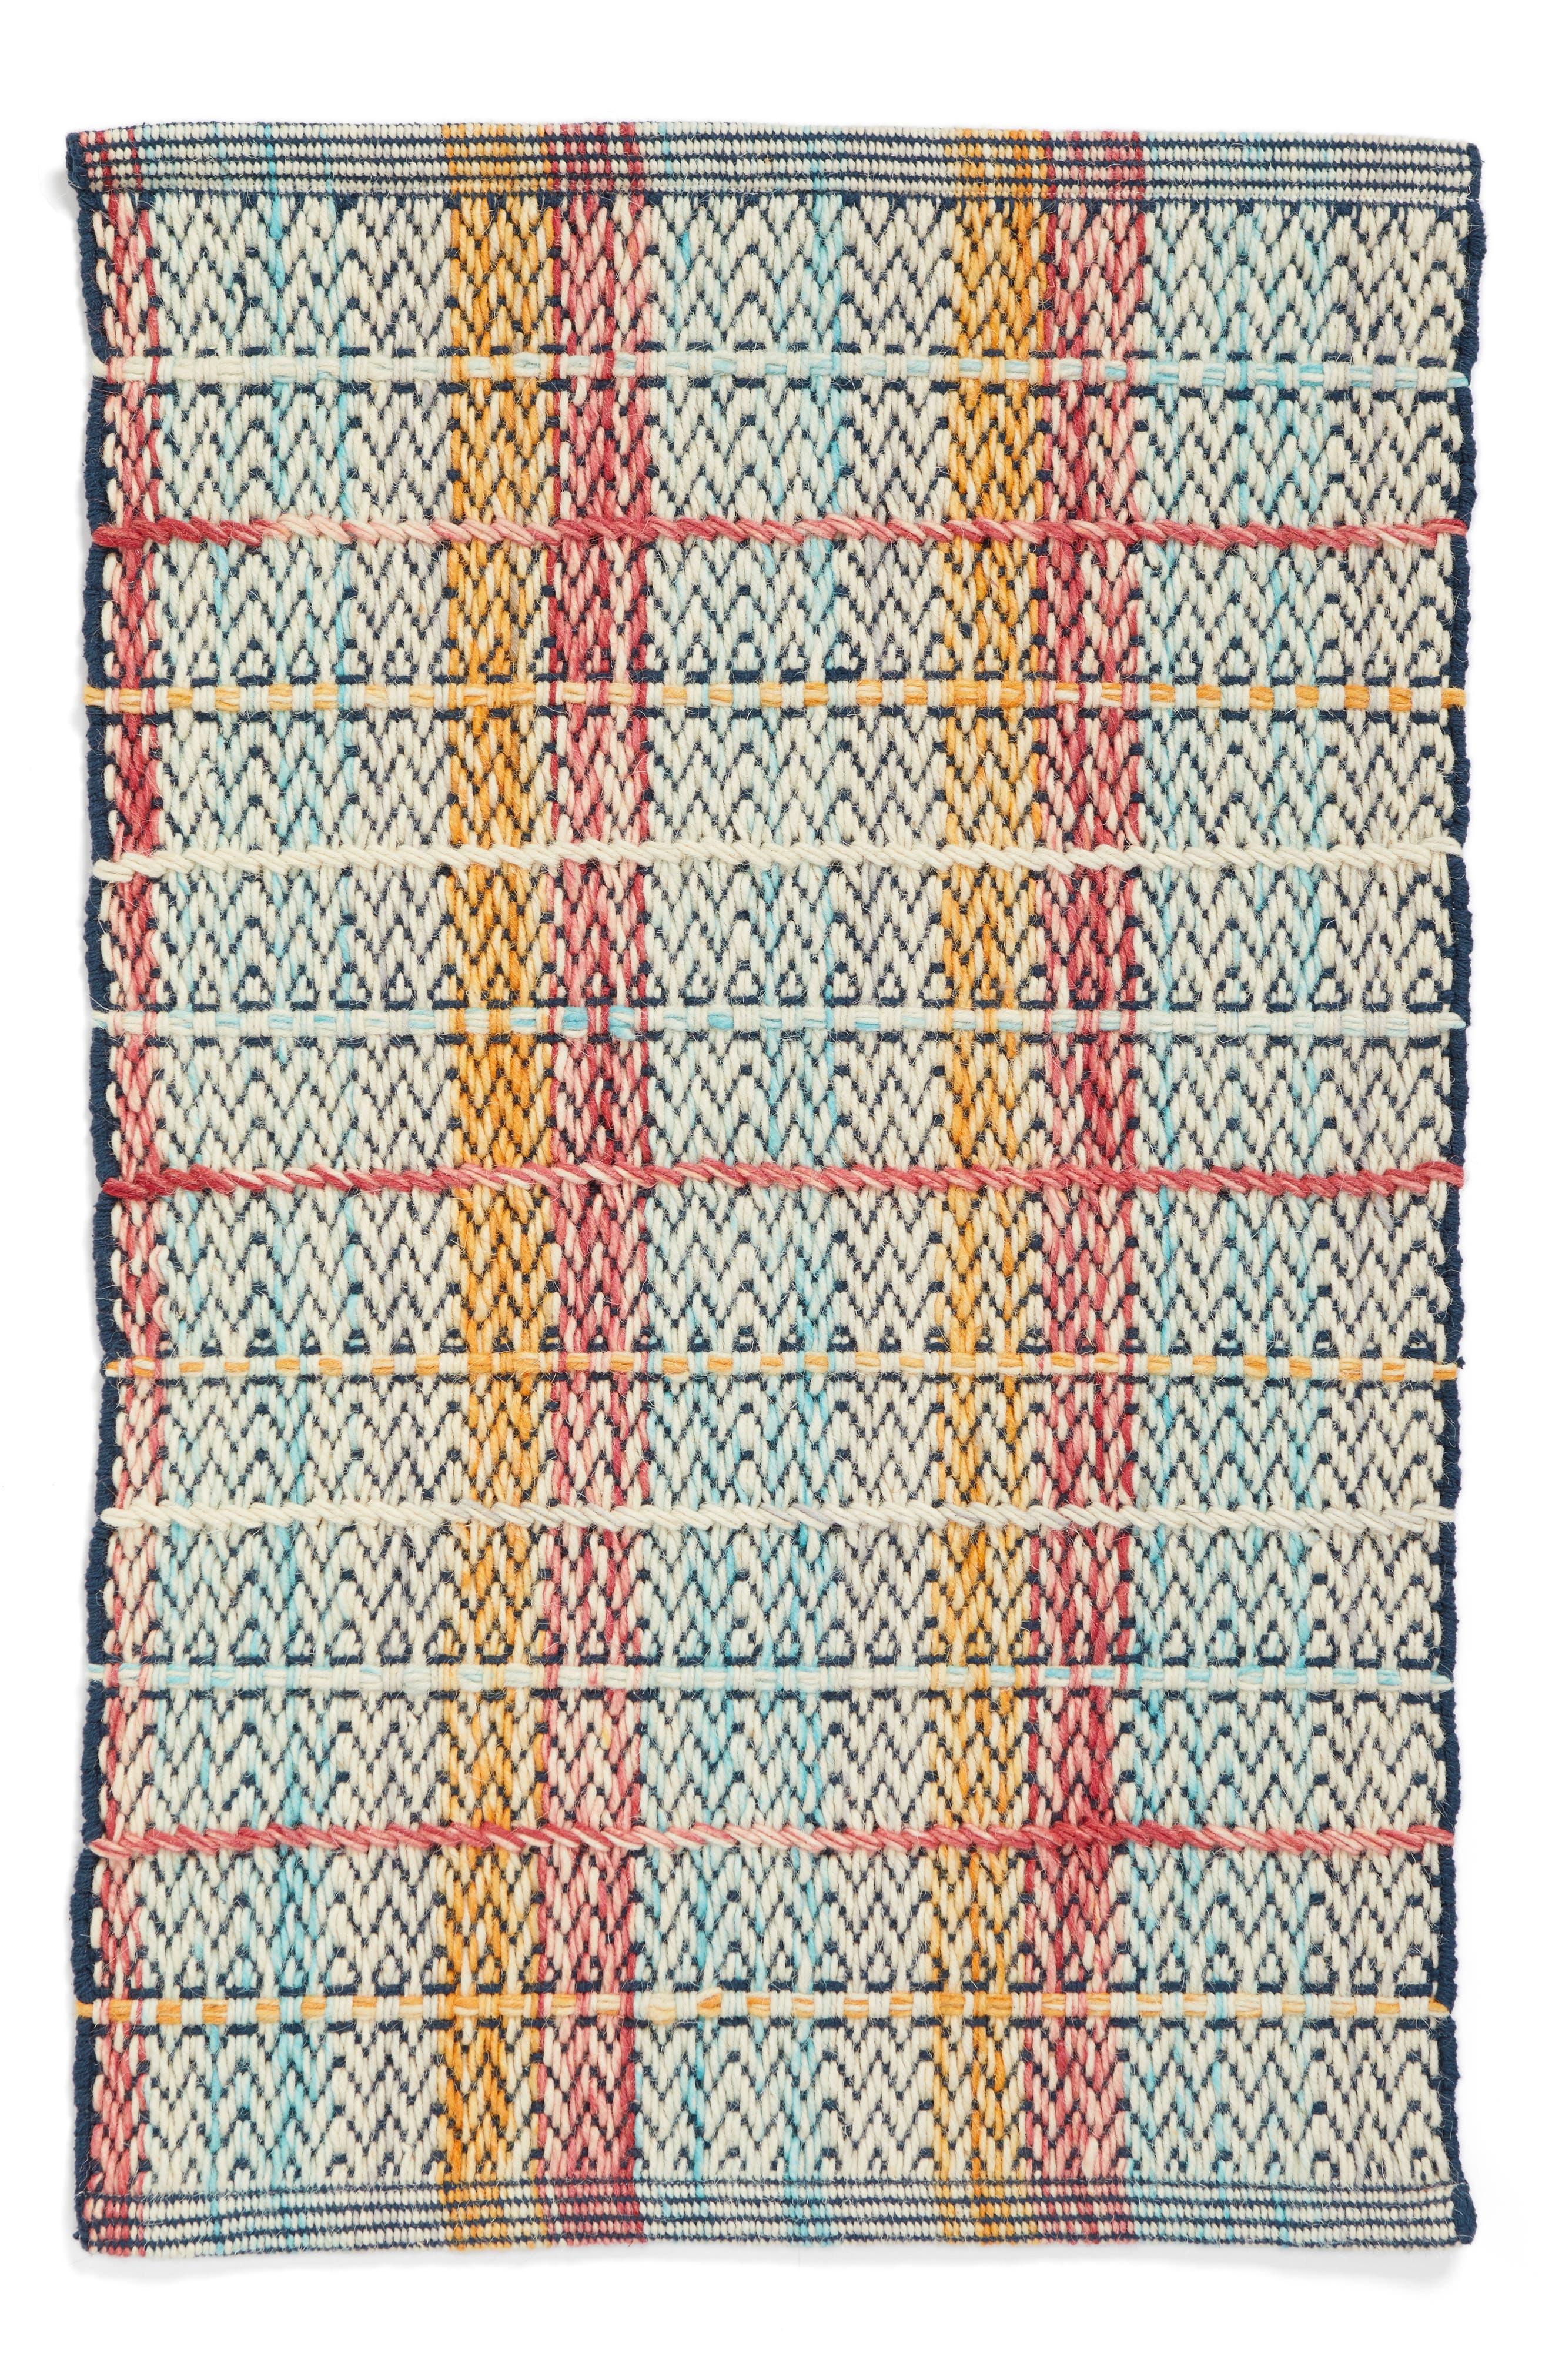 Stripe Handwoven Area Rug,                         Main,                         color, 900